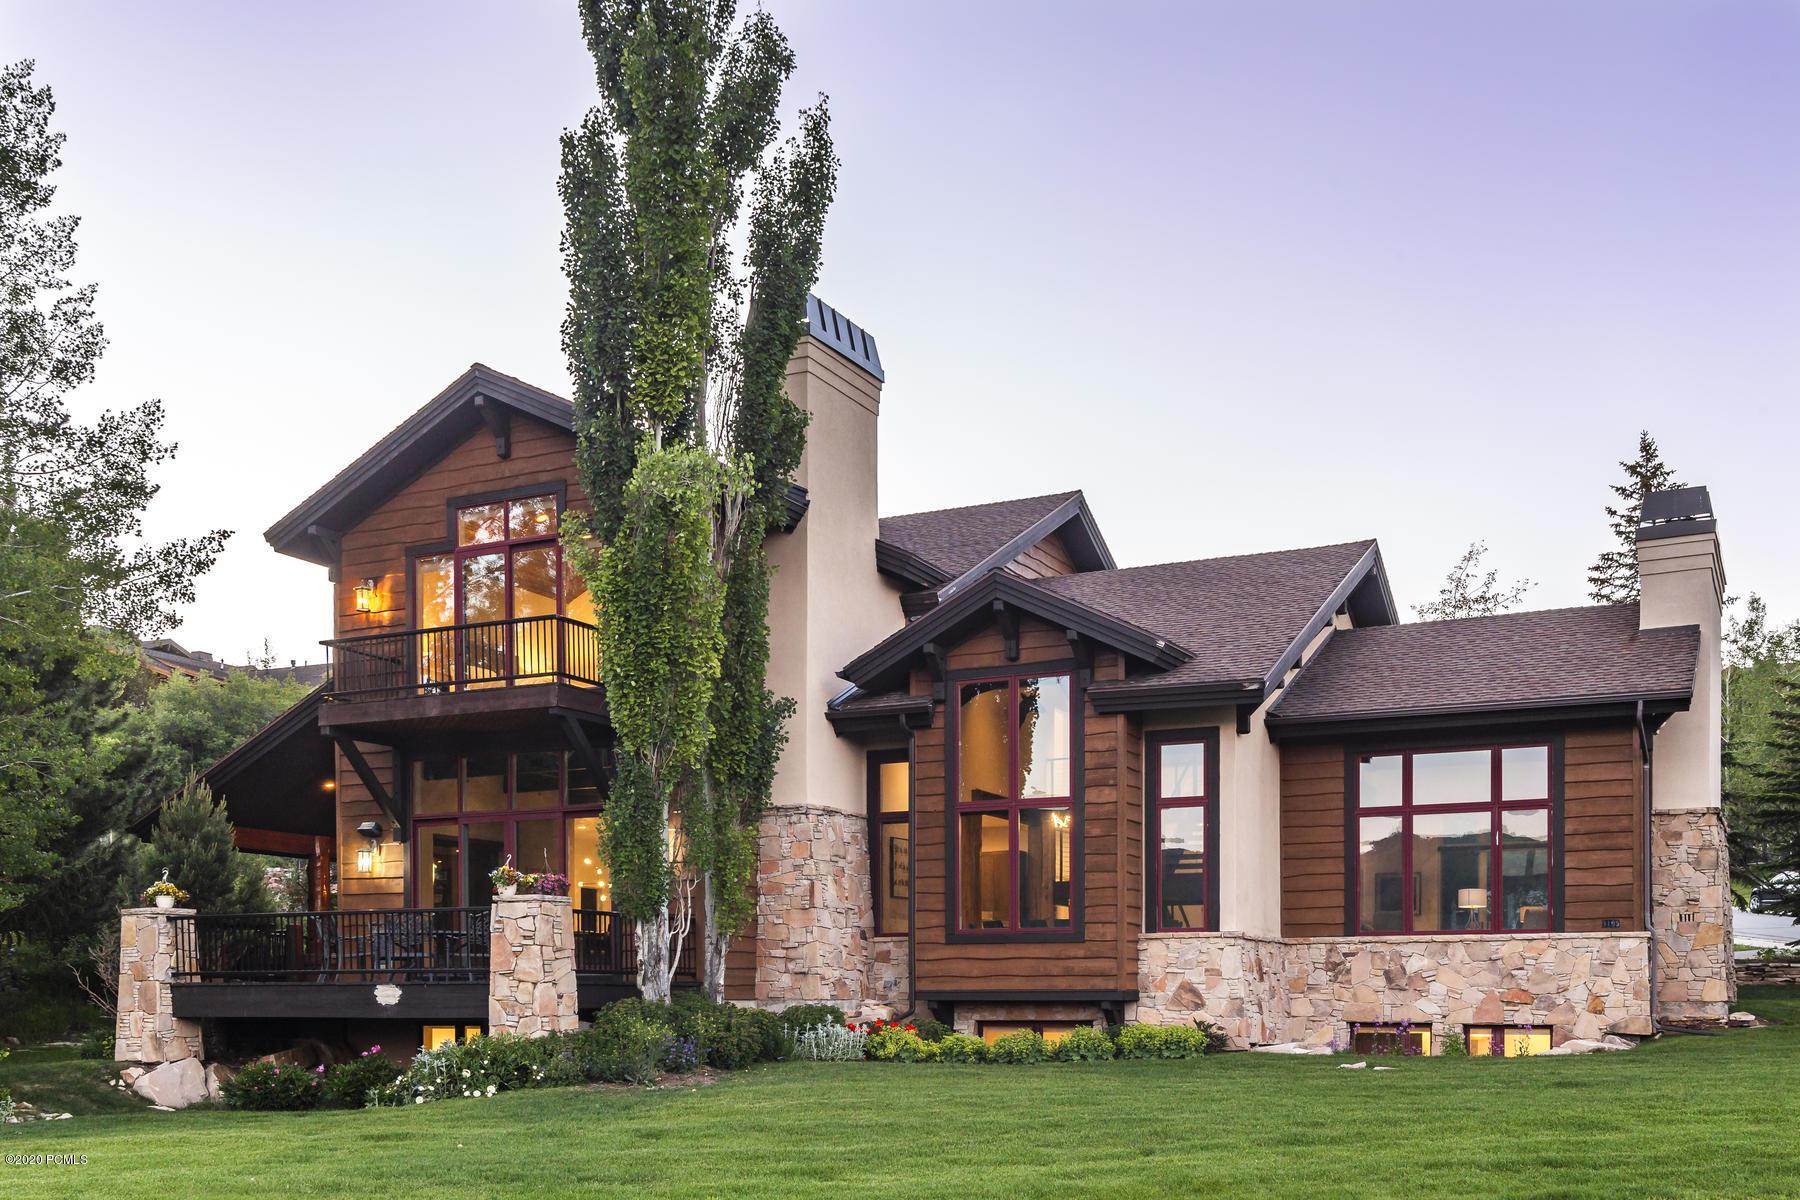 3195 Mountain Top Lane, Park City, Utah 84060, 7 Bedrooms Bedrooms, ,8 BathroomsBathrooms,Single Family,For Sale,Mountain Top,20190109112430415765000000